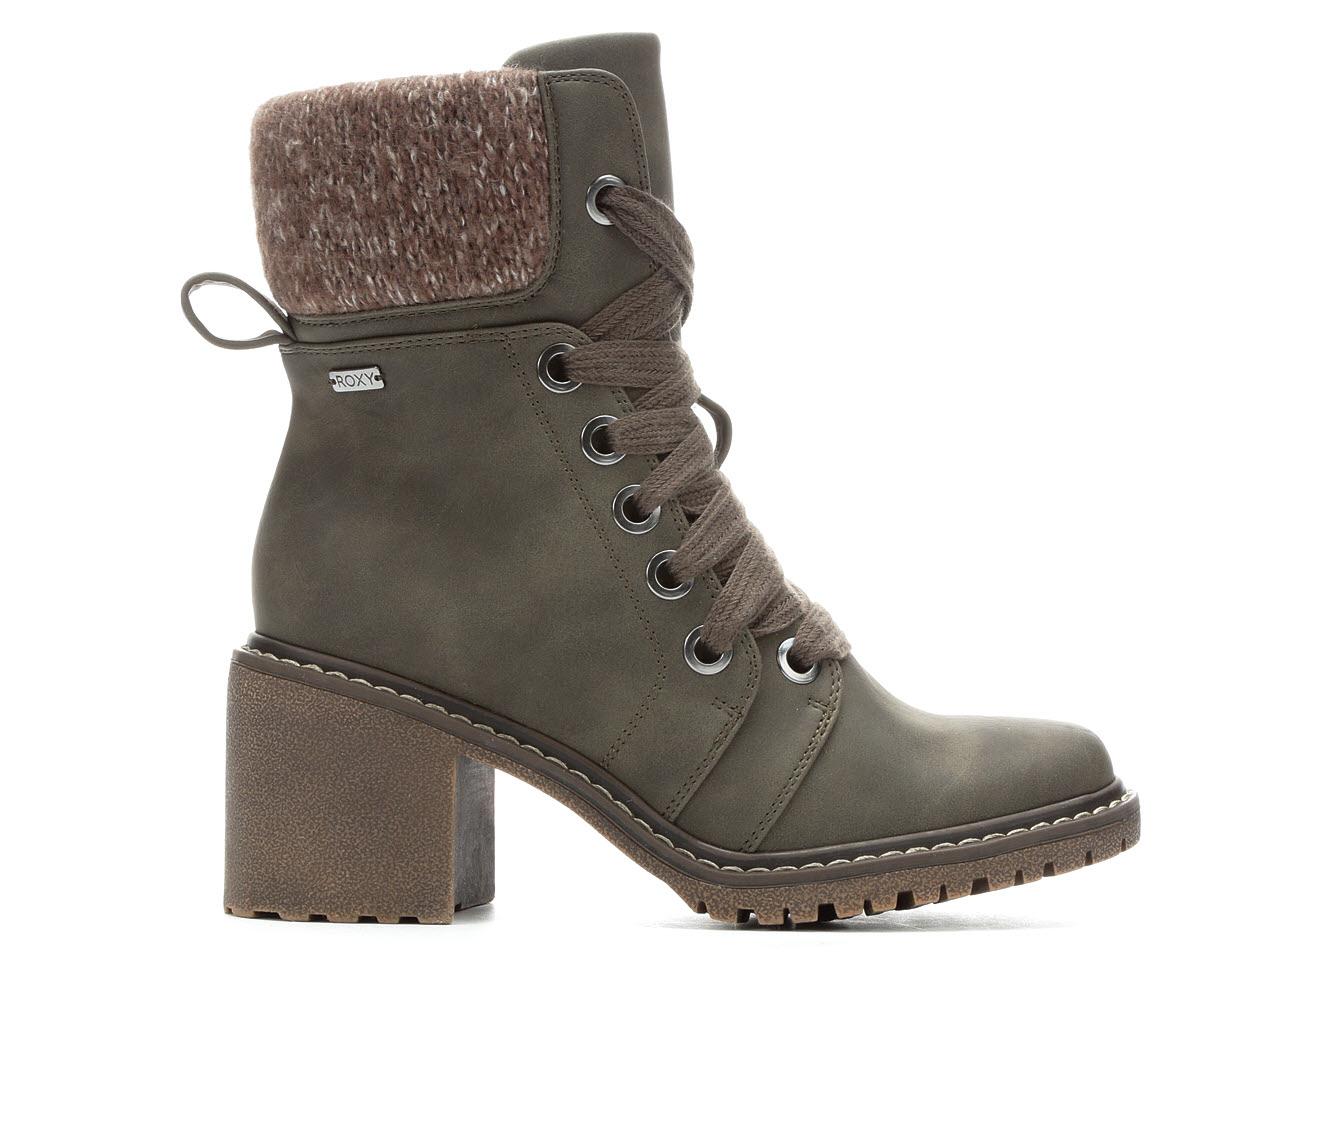 Roxy Whitley Women's Boot (Green Faux Leather)